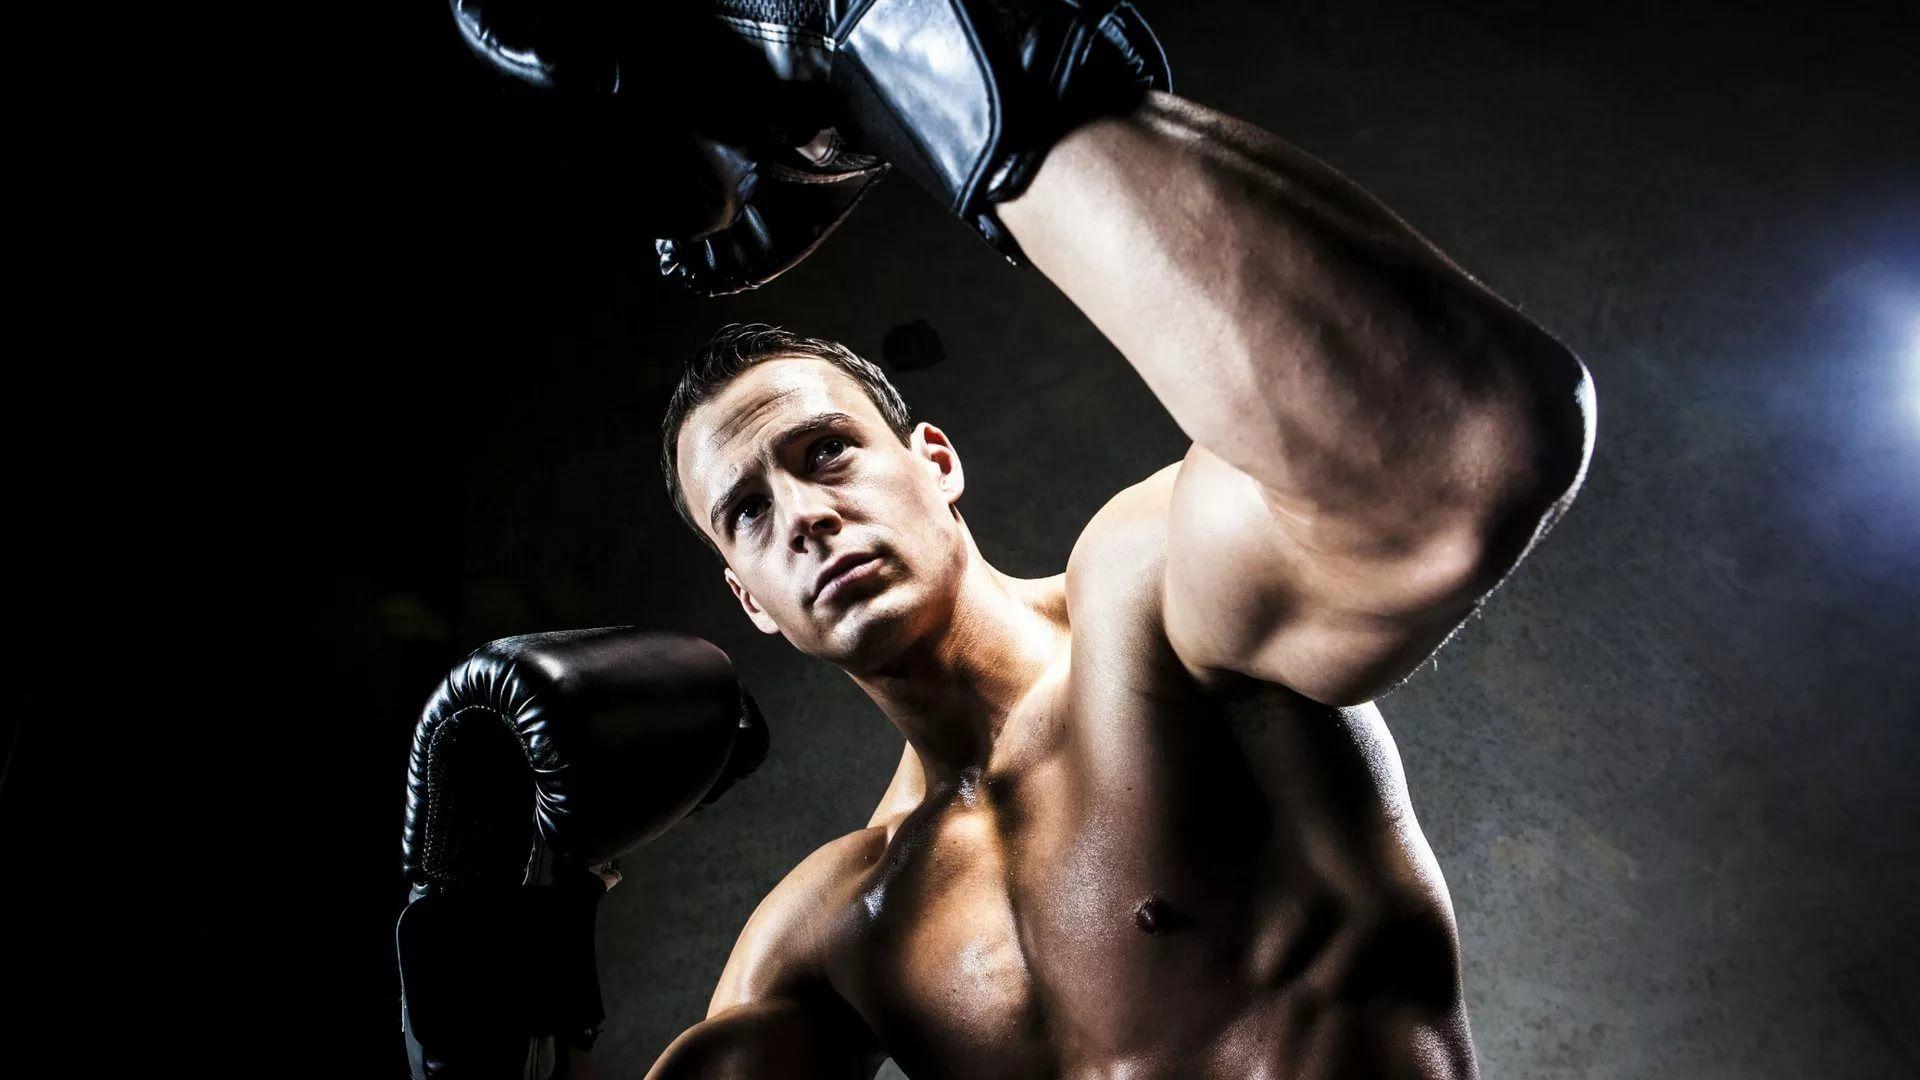 MMA Free Wallpaper